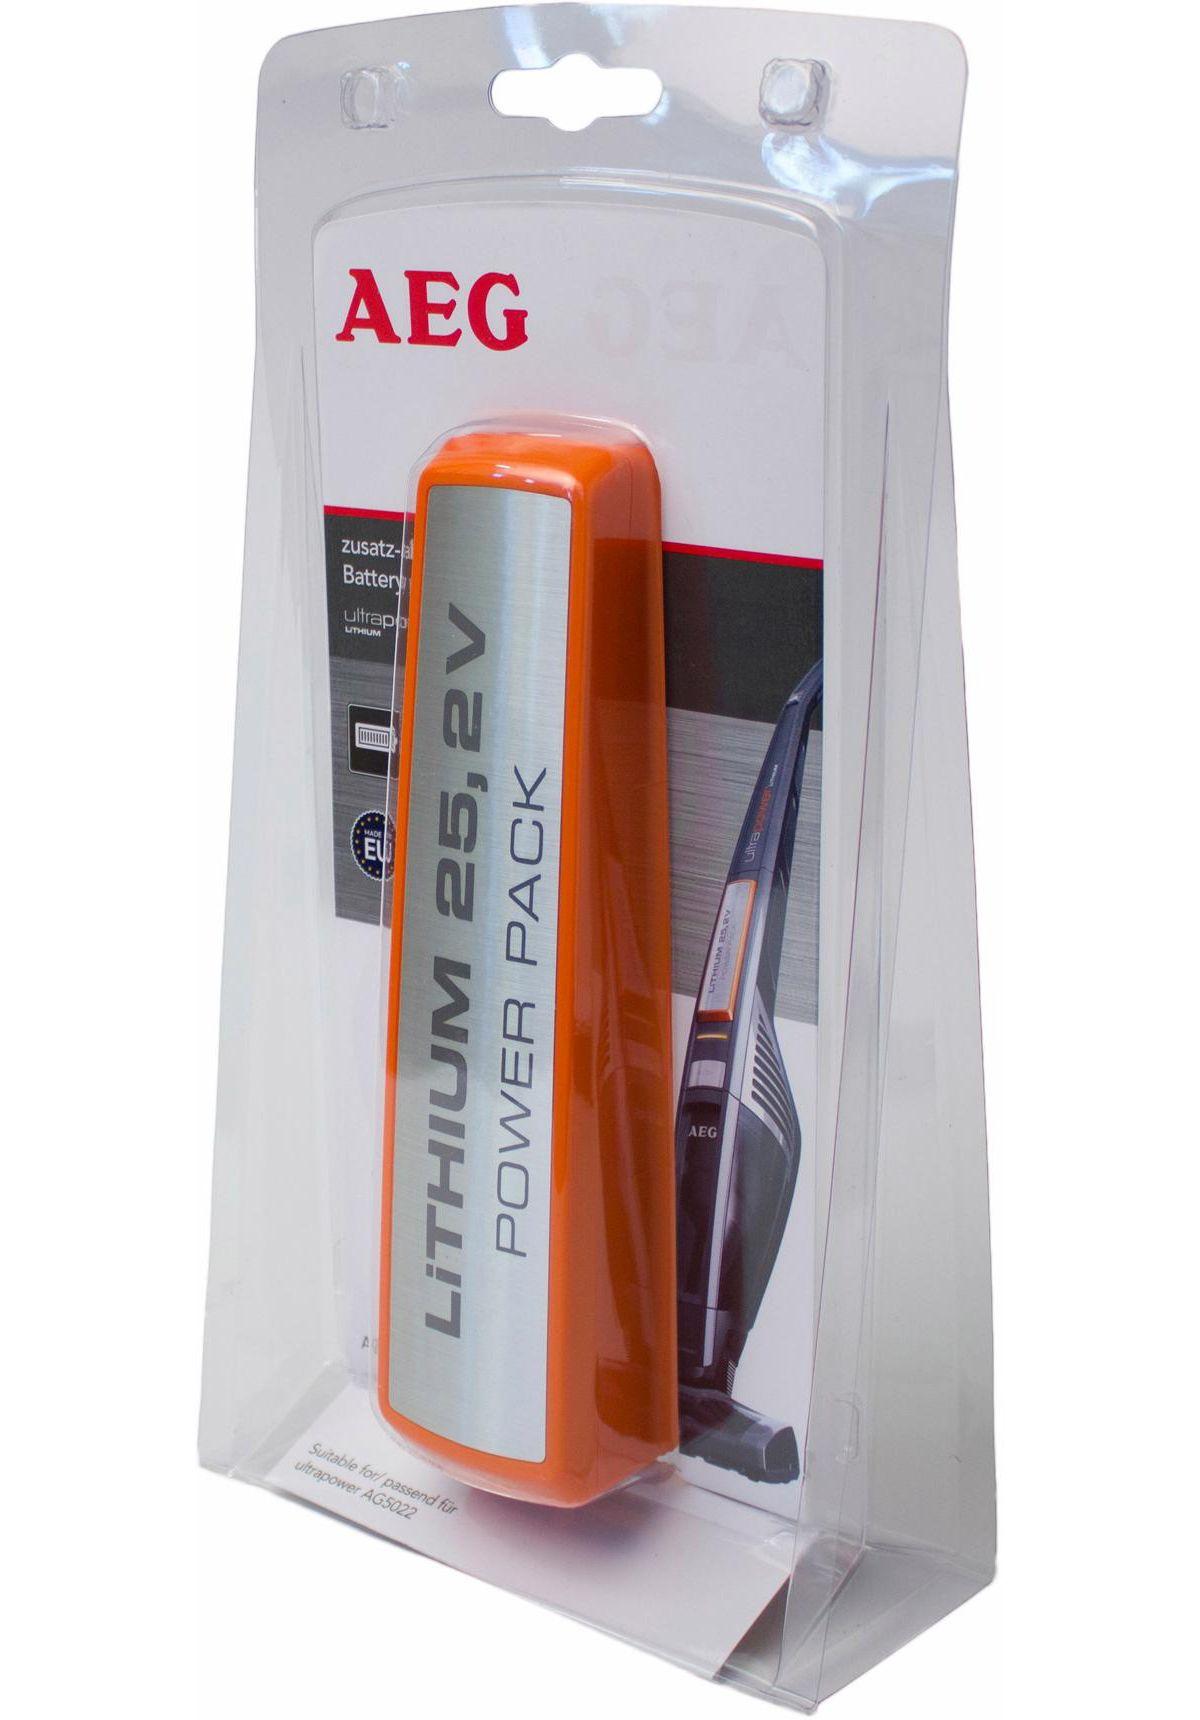 AEG AZE 037, Zusatz-Akku für UltraPower AG5022,...